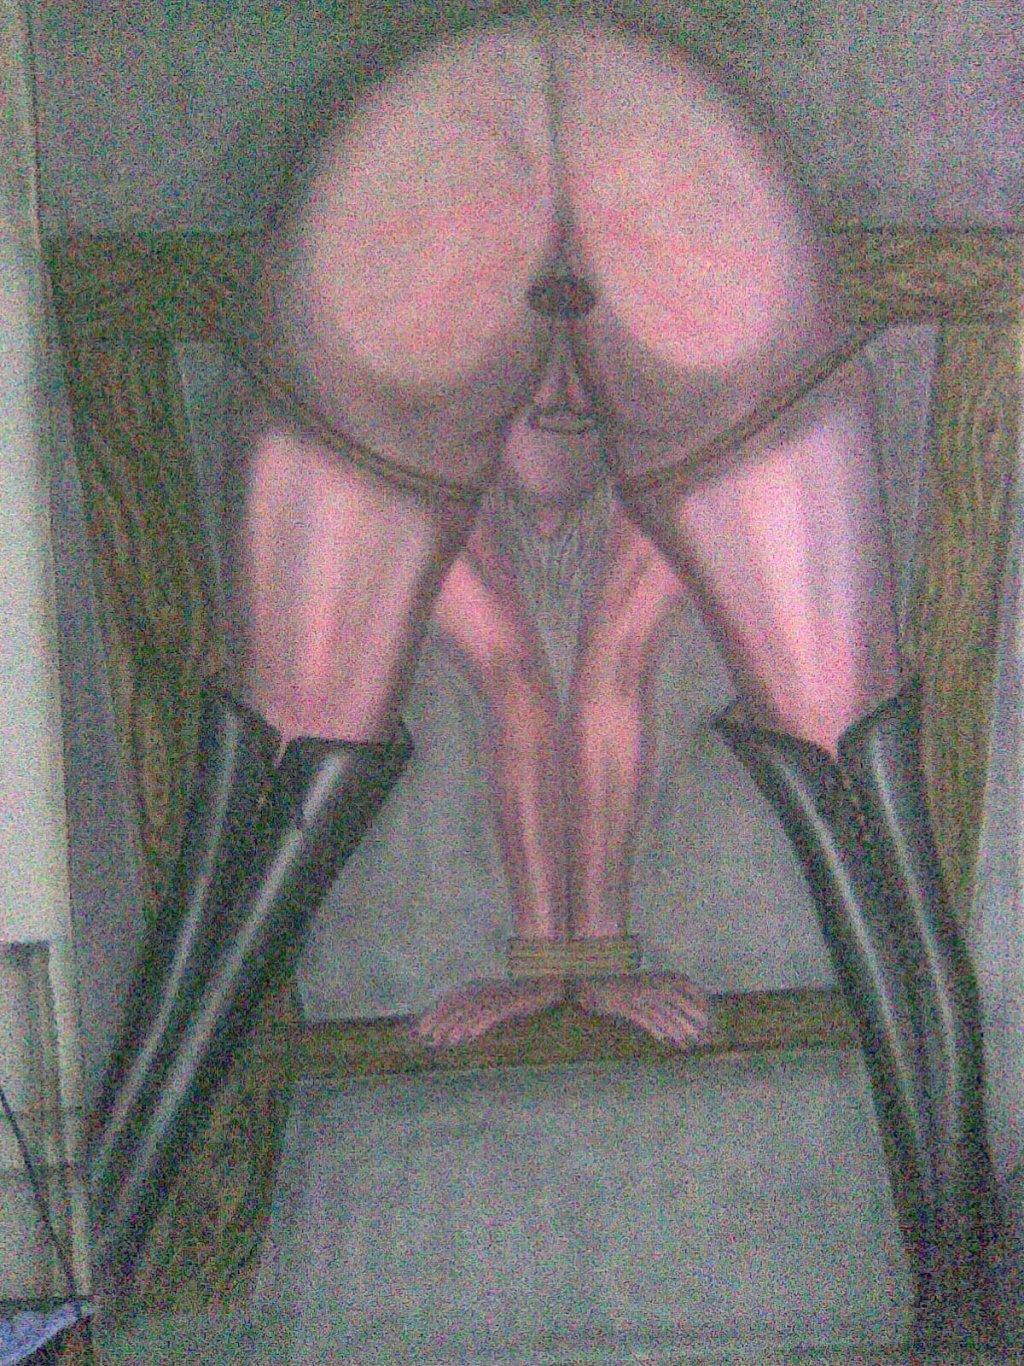 Panty in pantyhose vids